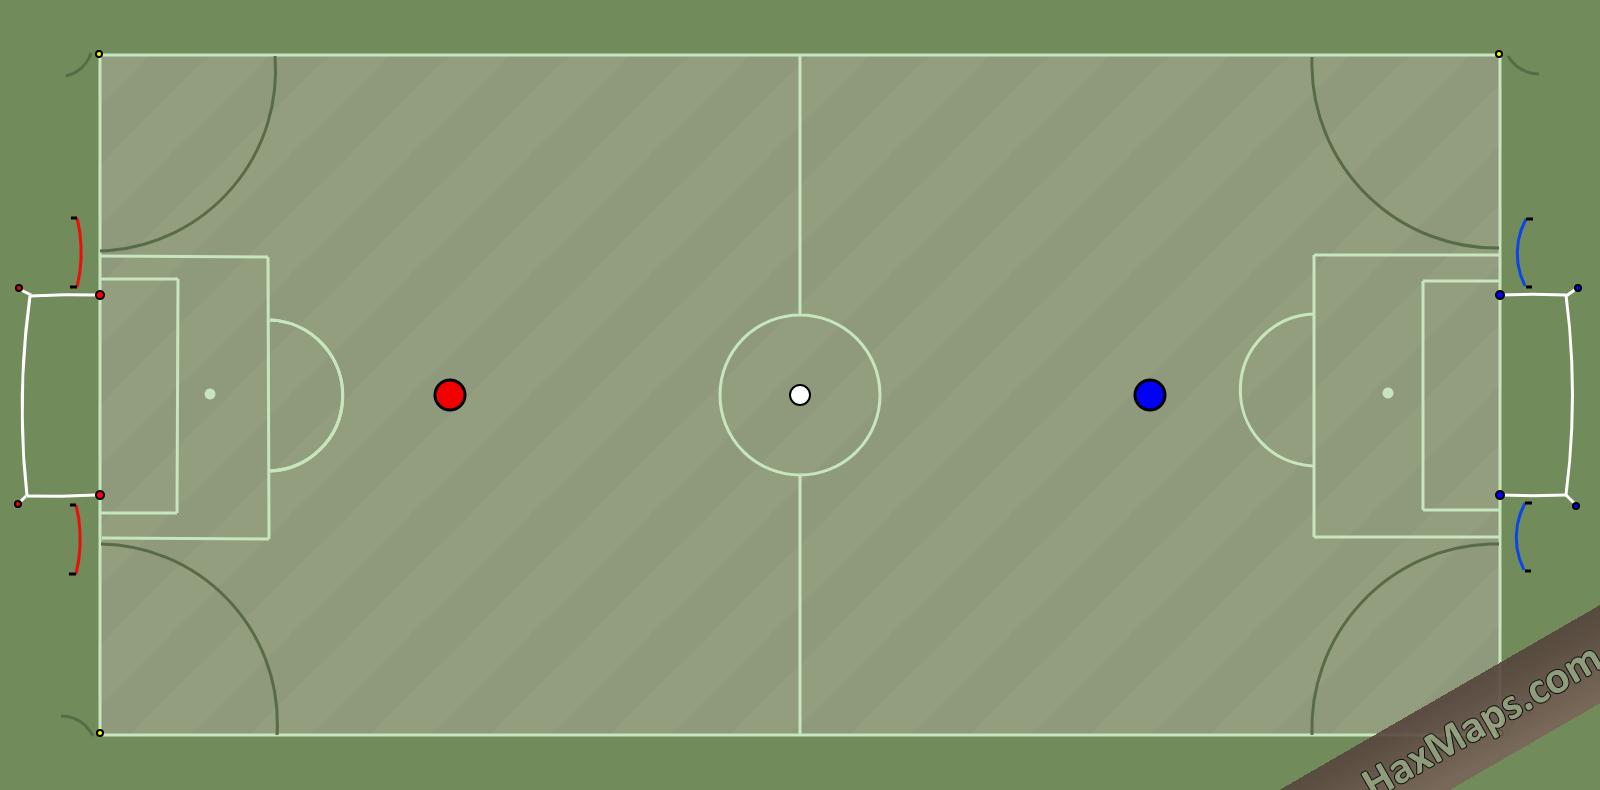 hax ball maps | Mini Real Soccer 3v3